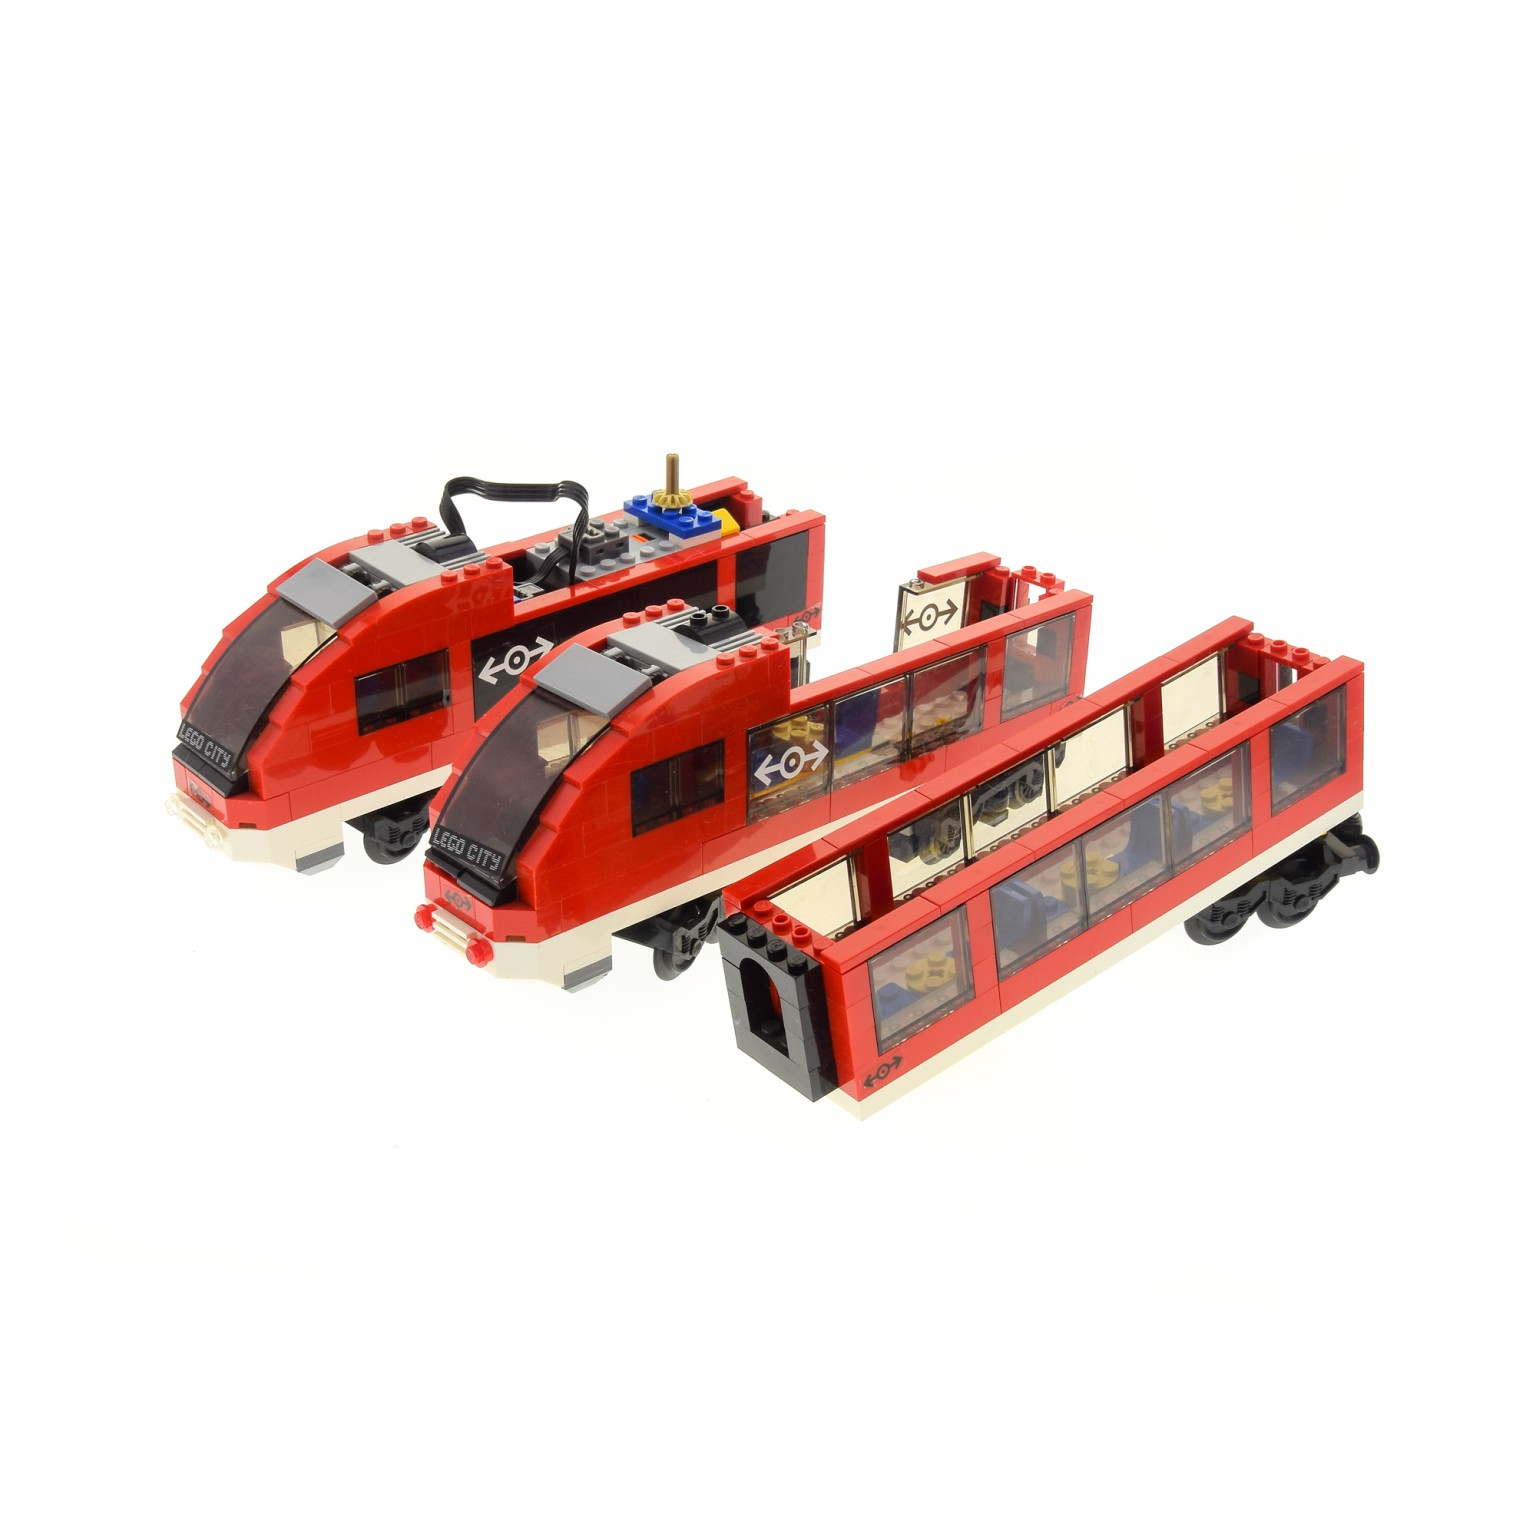 1 X Lego Brick For Set 7938 Passenger Train Model Incomplete